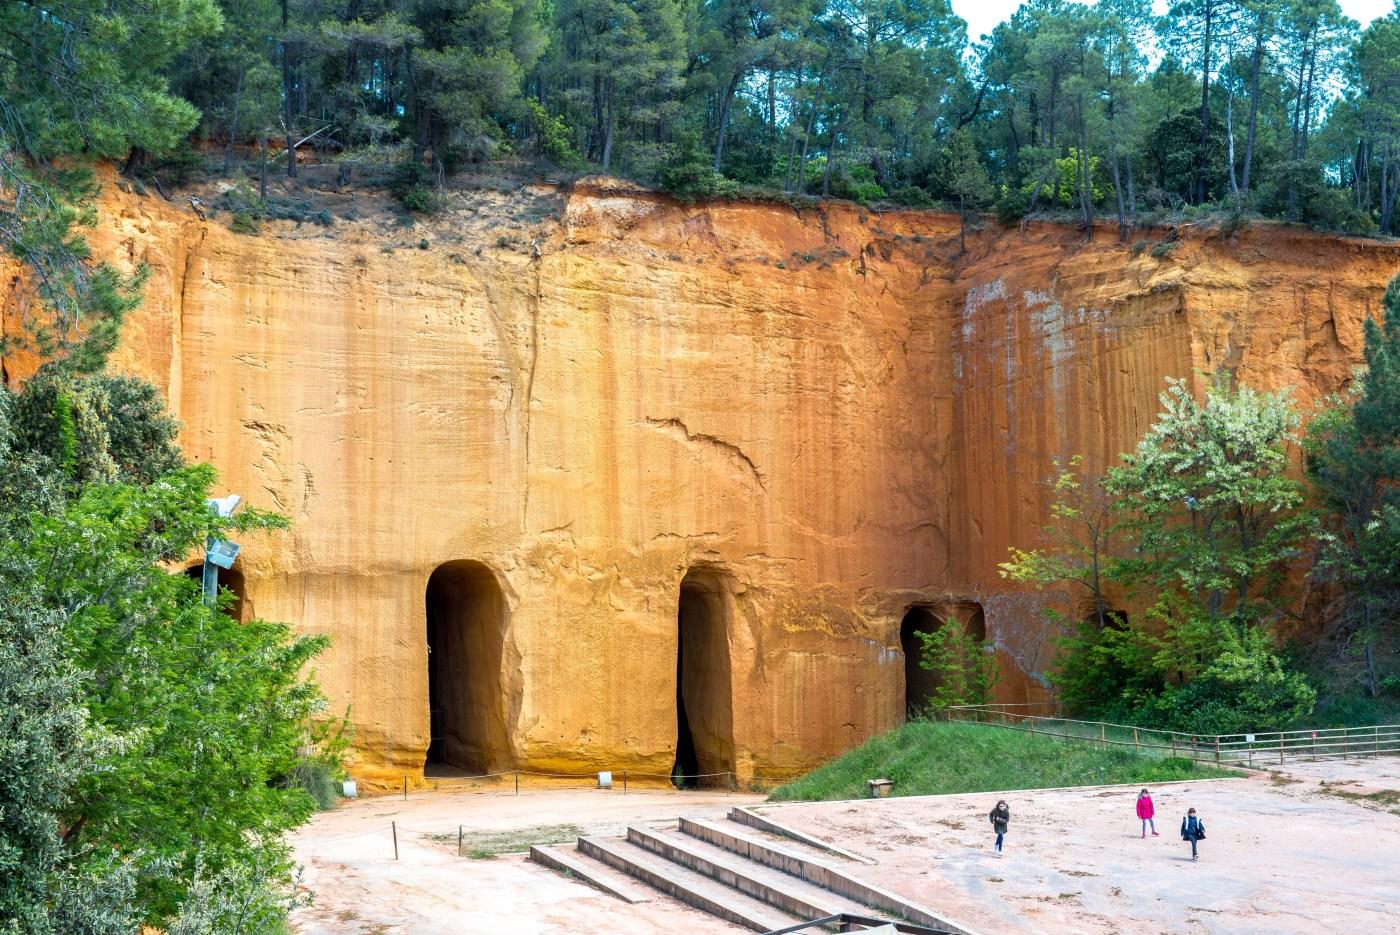 Colorado Provençal Gargas Mines de Bruoux